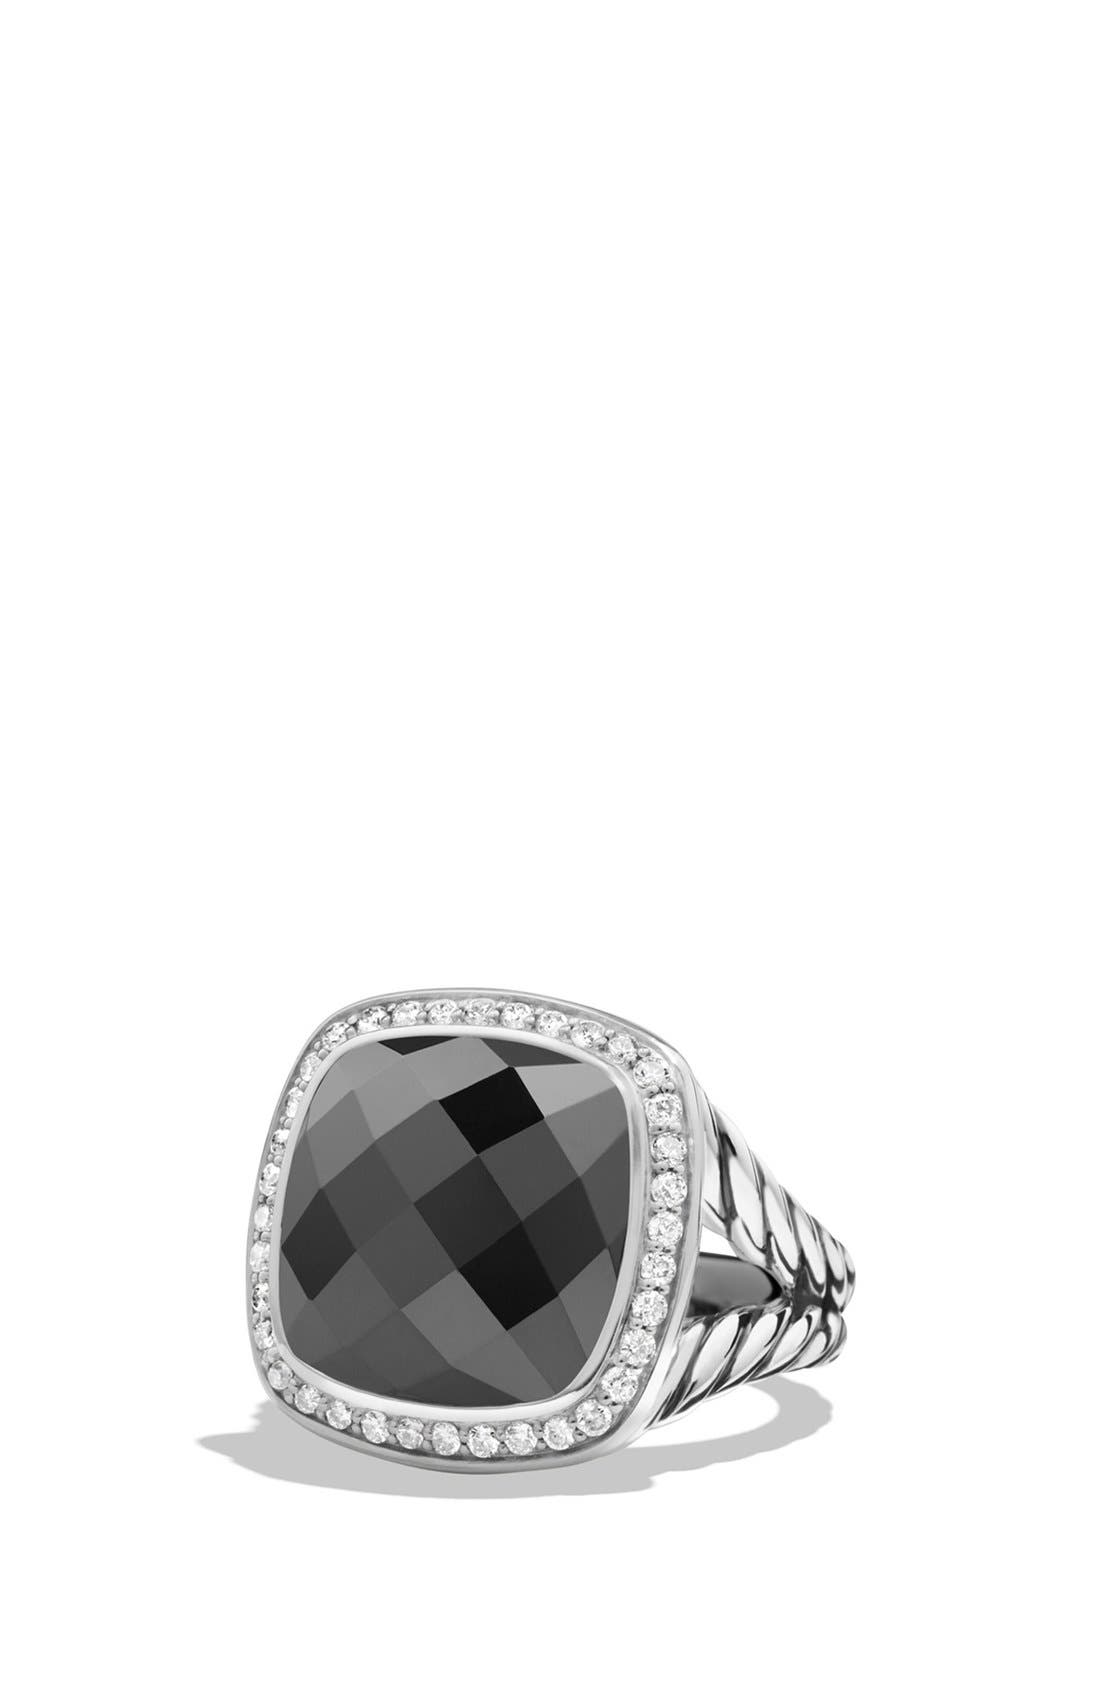 Main Image - David Yurman 'Albion' Ring with Semiprecious Stone and Diamonds